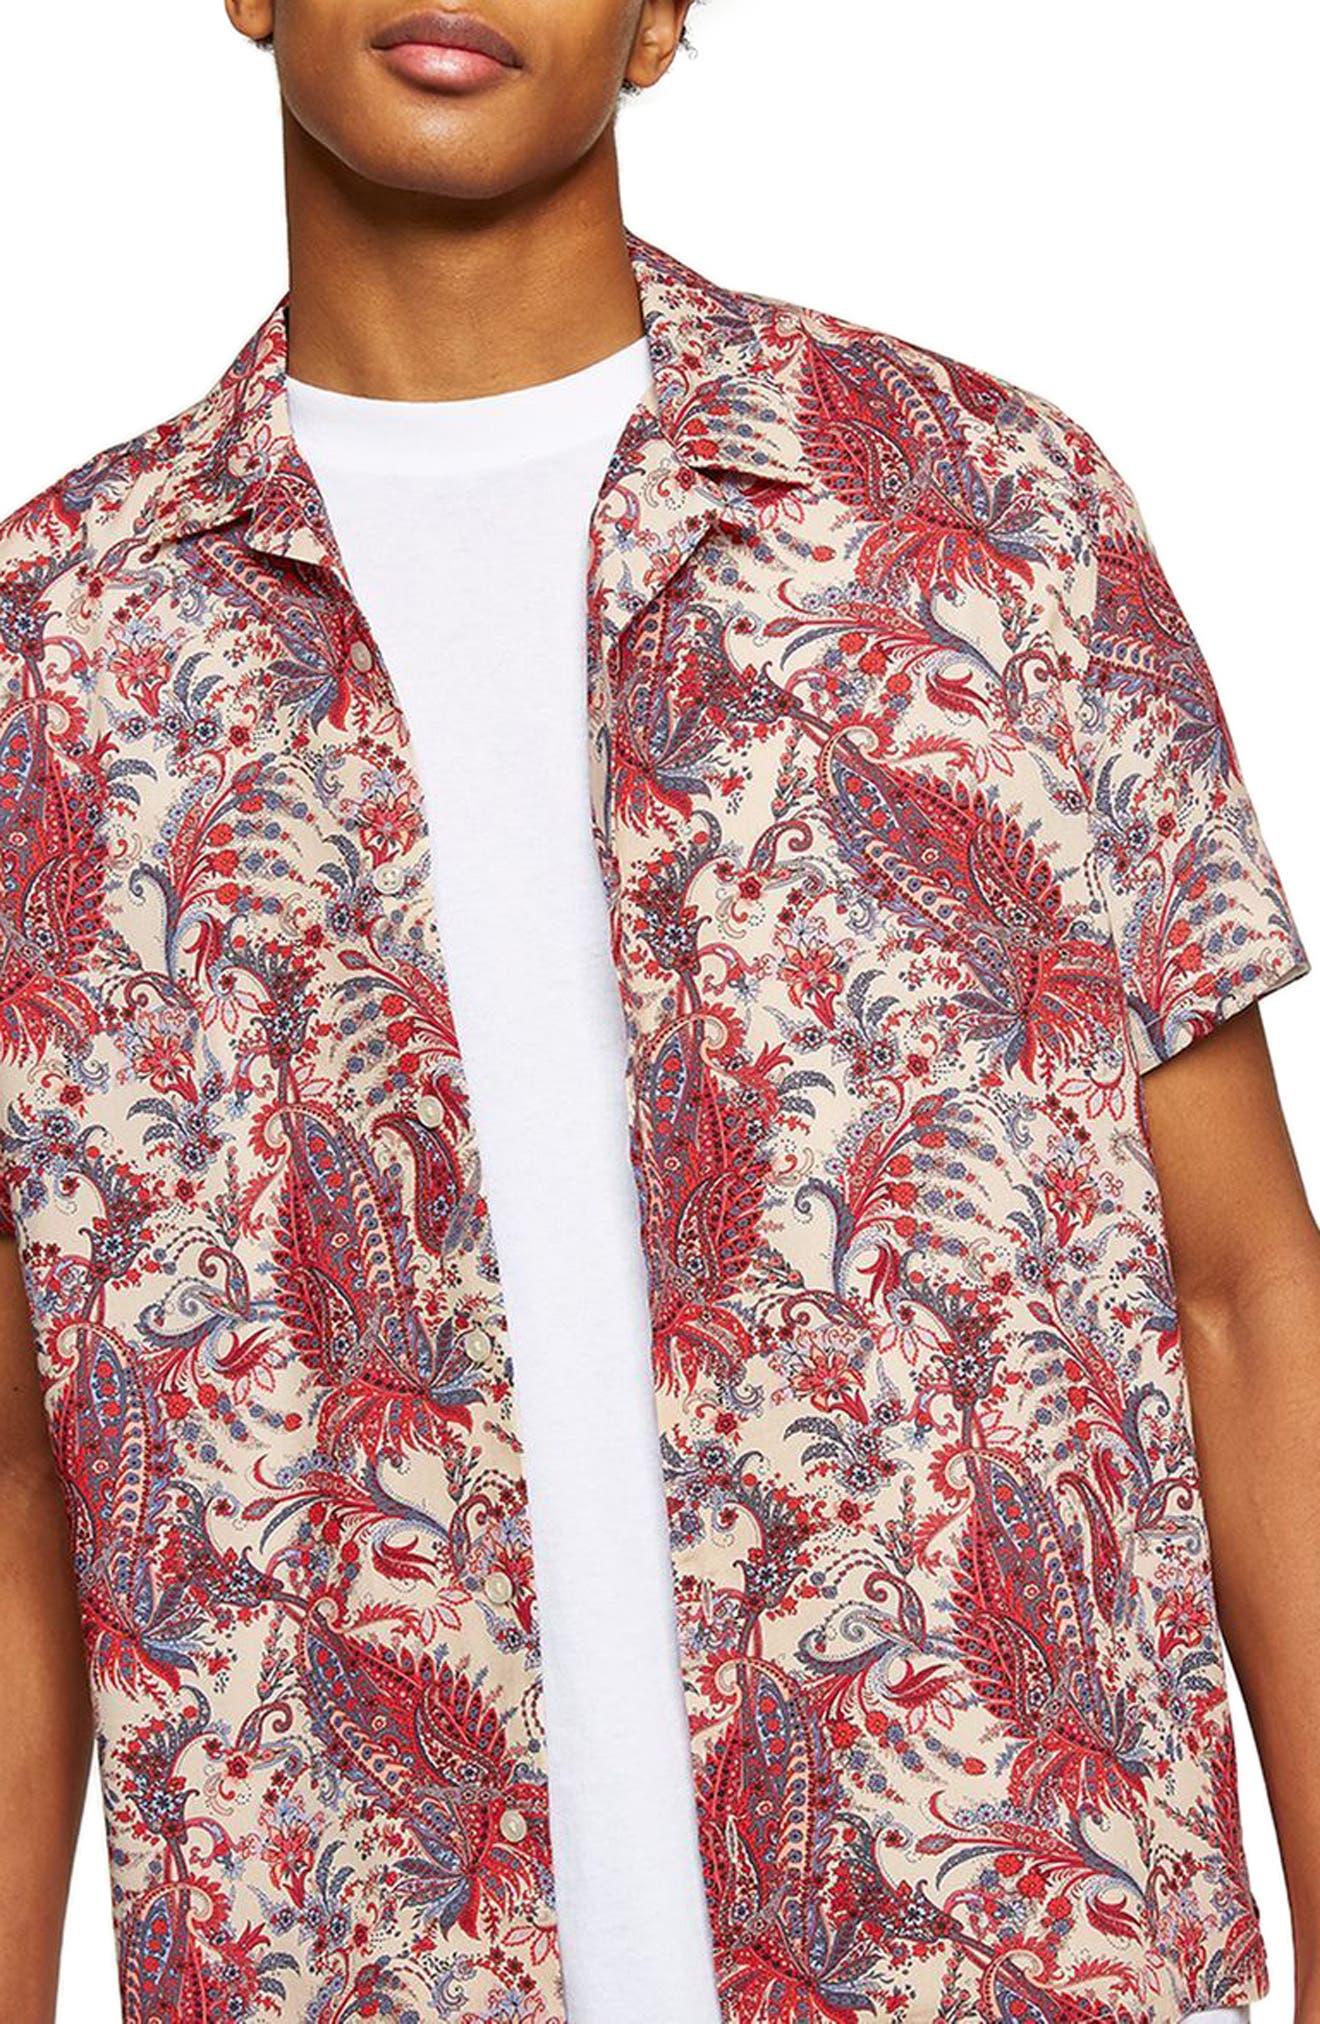 Paisley Camp Shirt,                         Main,                         color, PINK MULTI